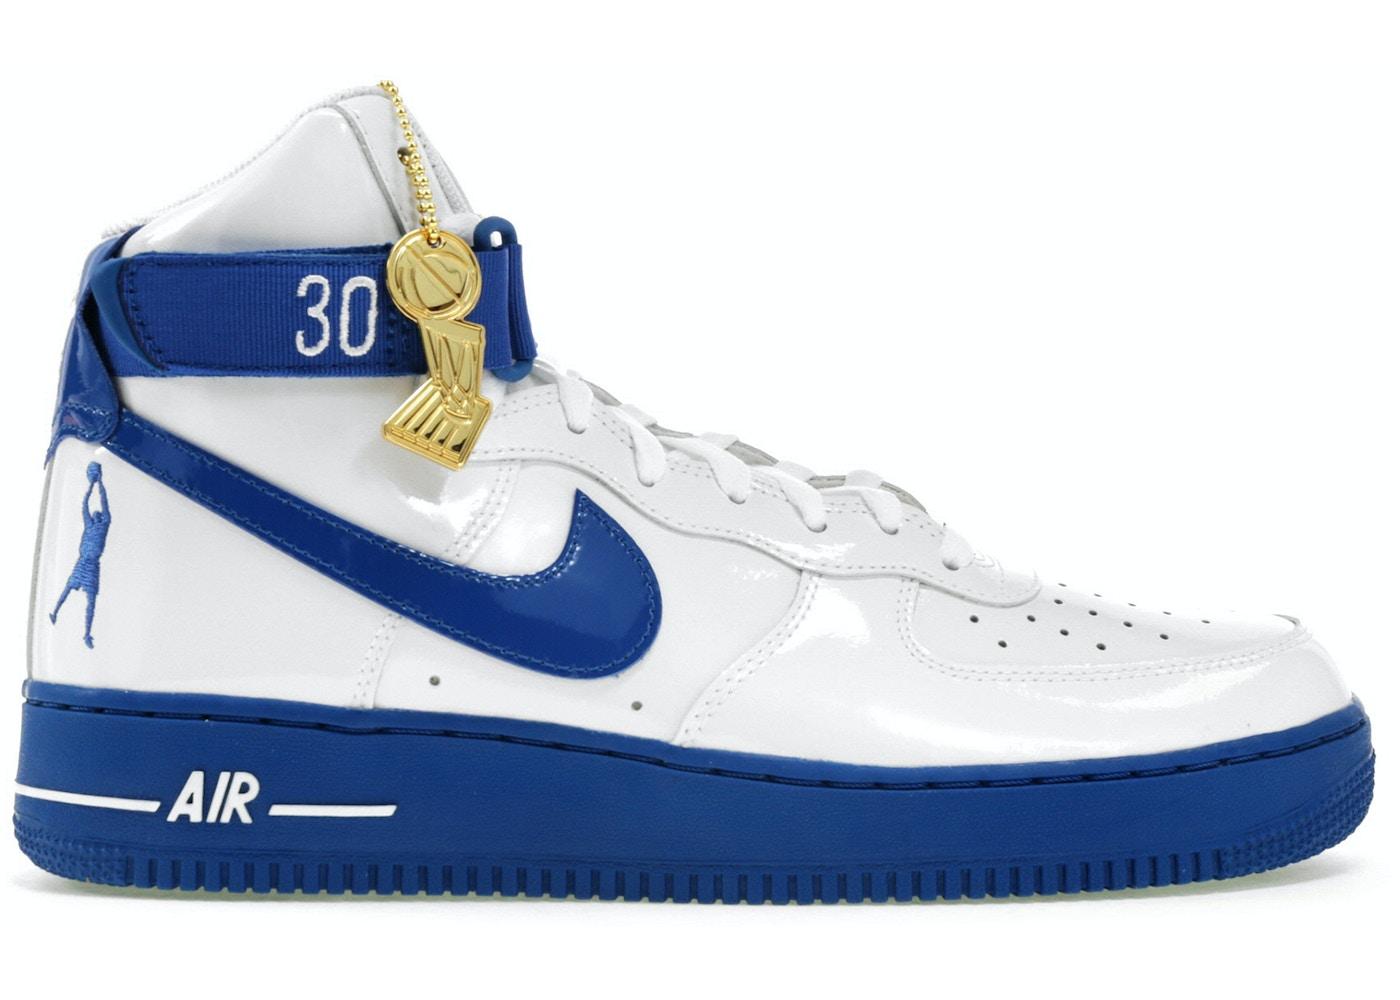 Nike Air Force 1 High Sheed Think 16 (Rude Awakening) - AQ4229-100